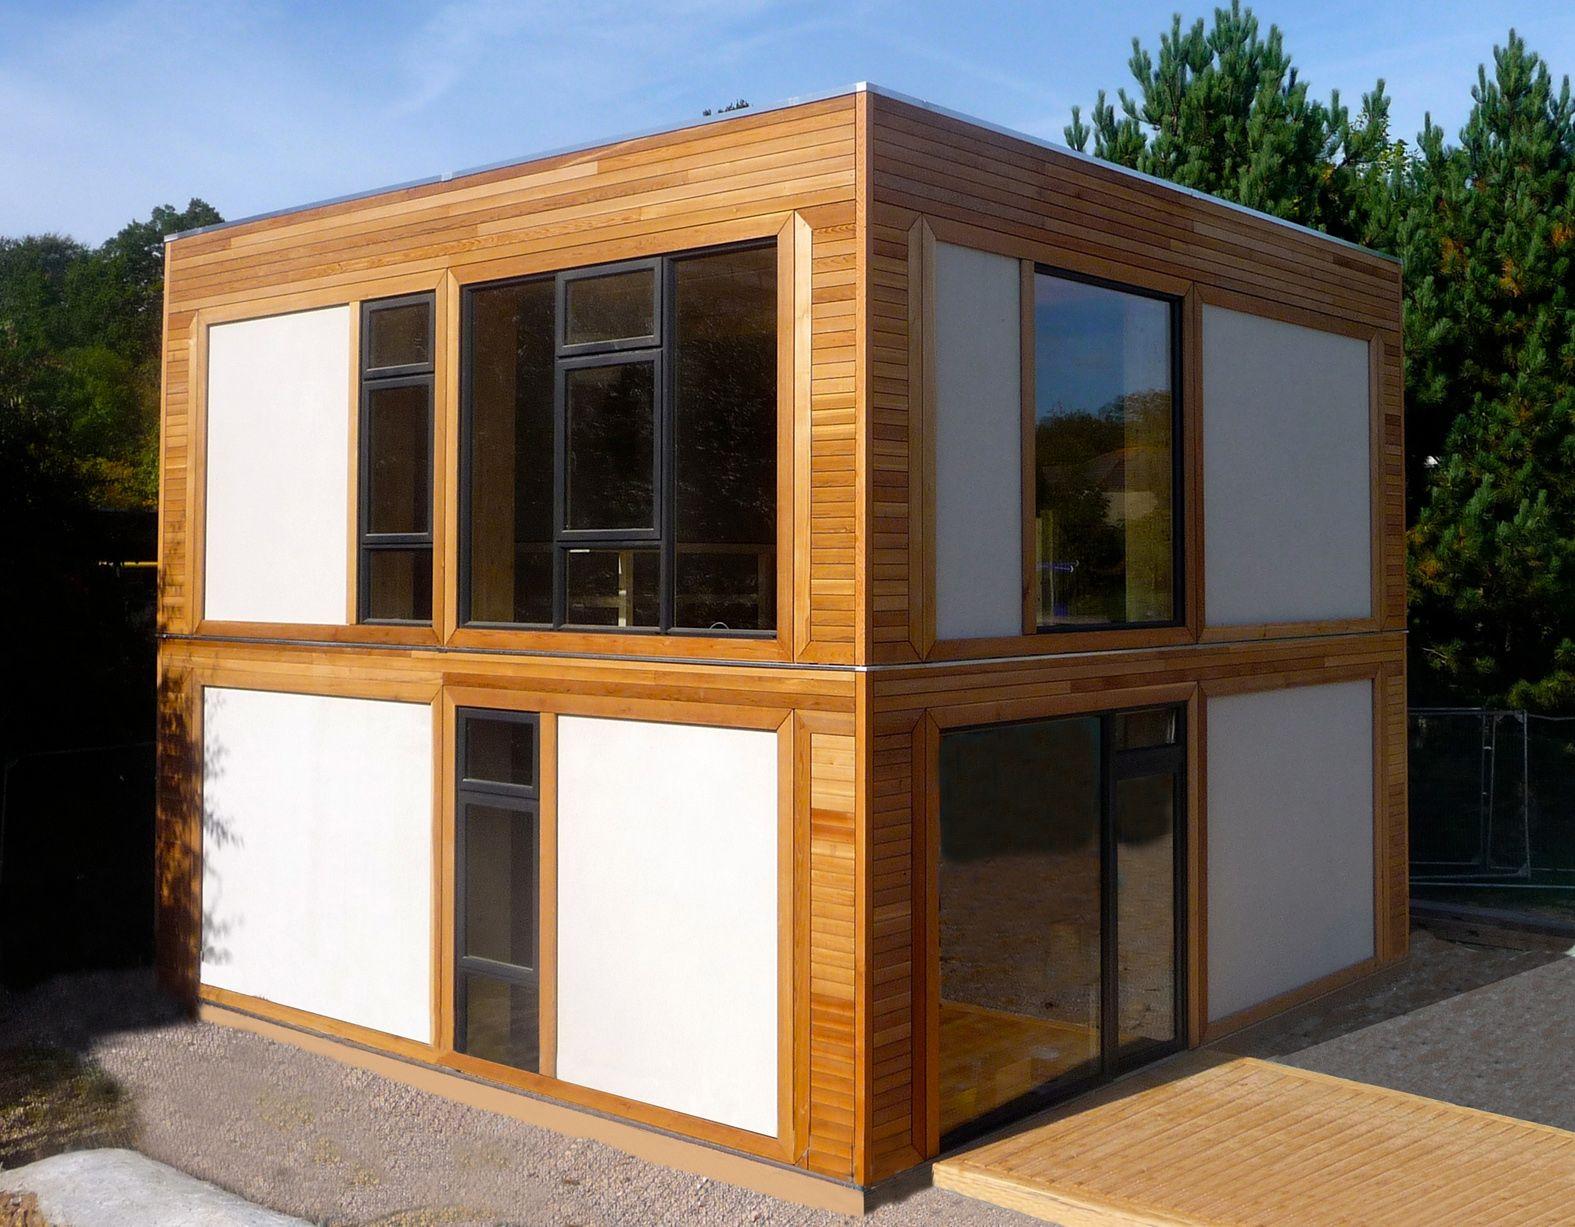 decorations-exterior-elegant-wooden-square-modular-prefab-homes ...